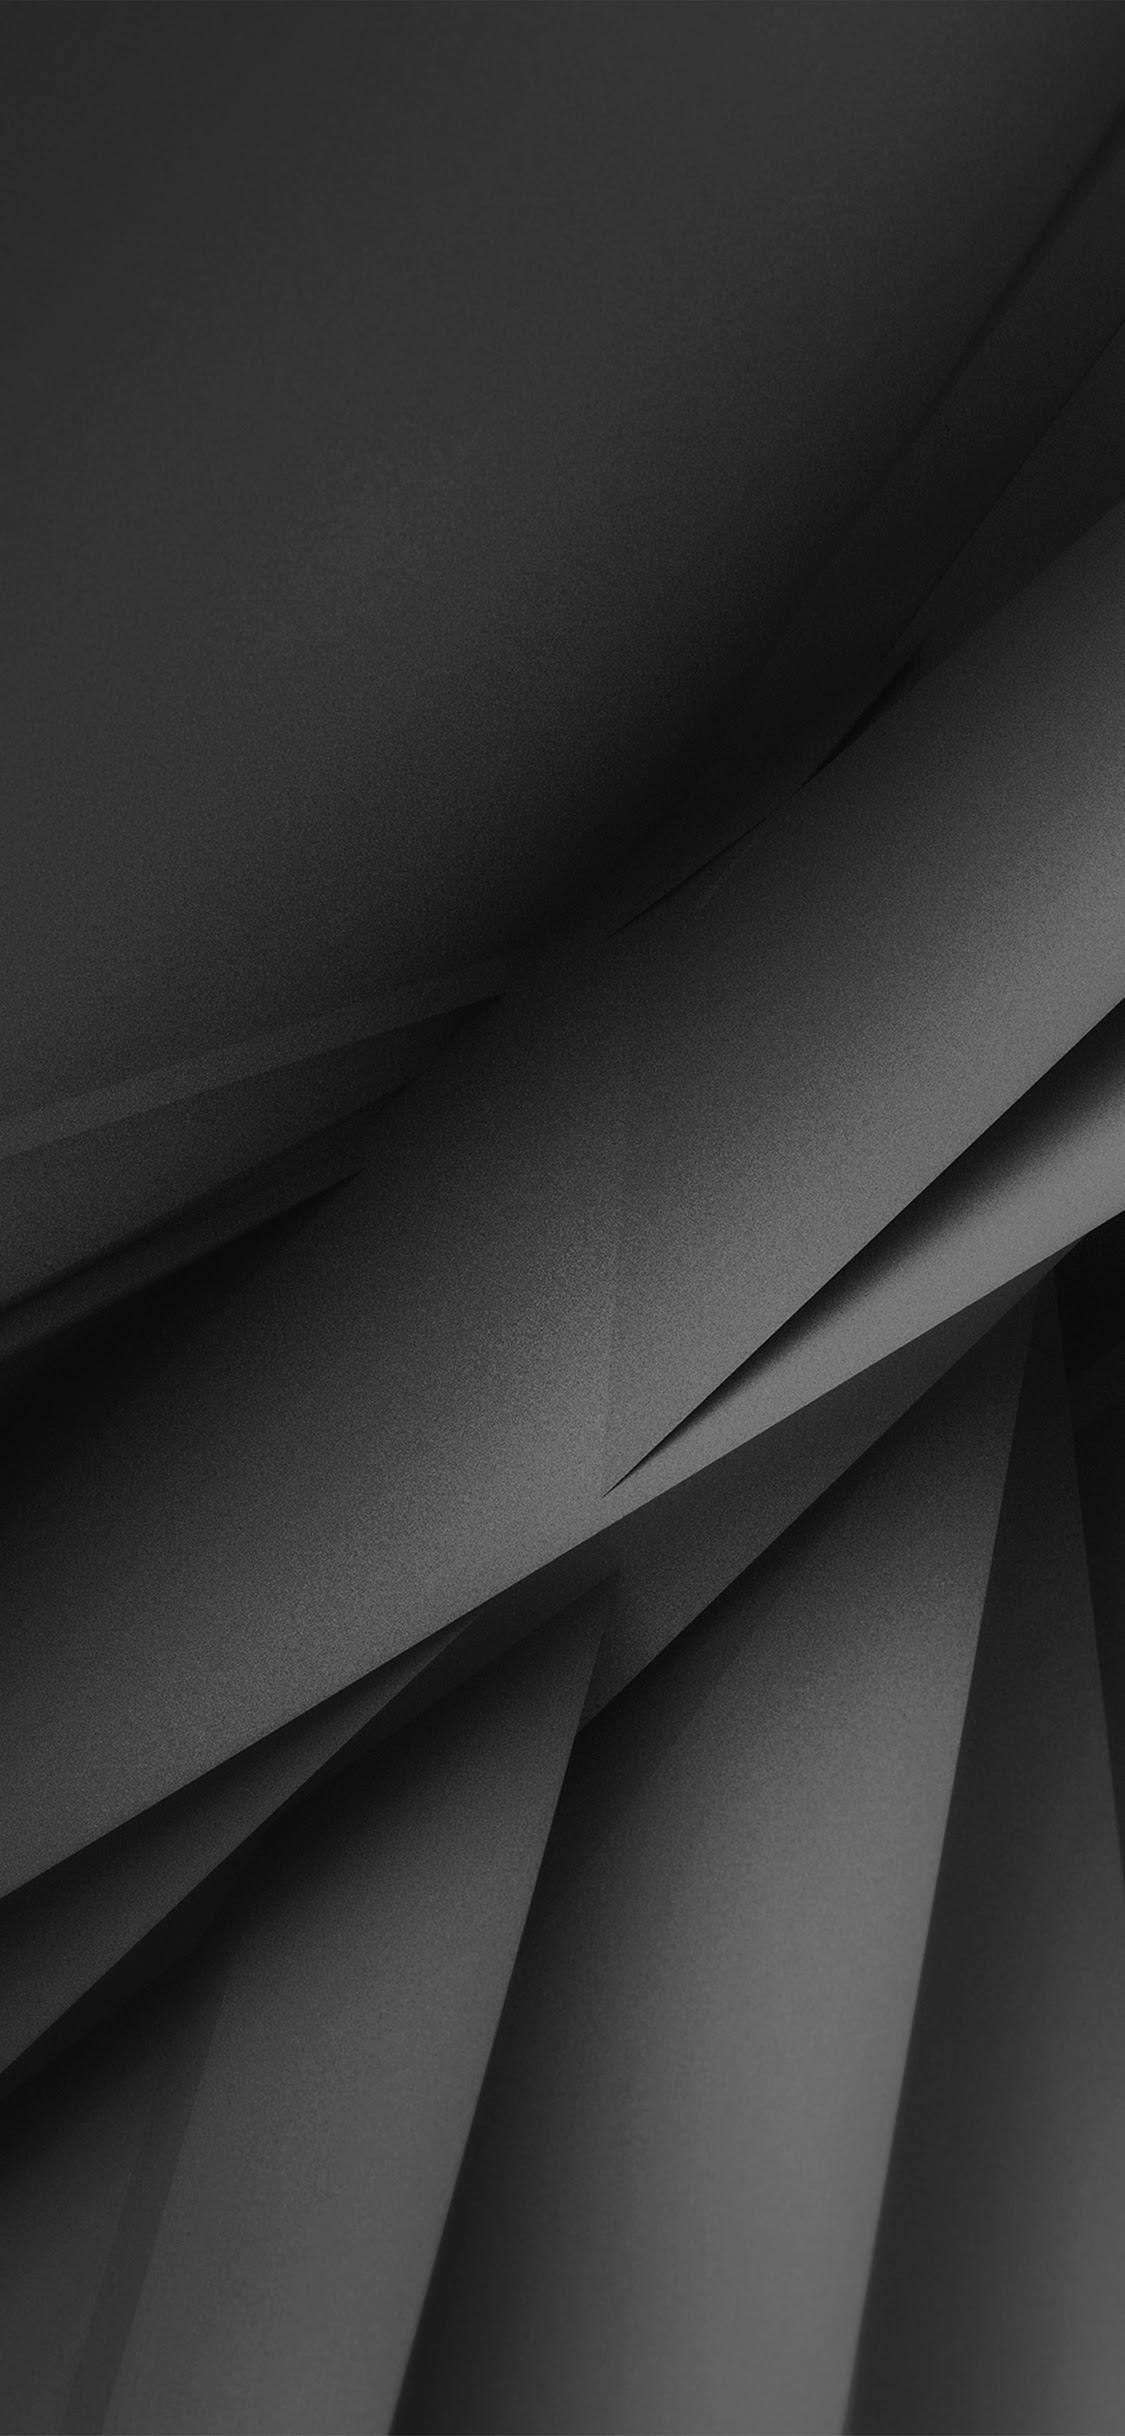 iPhonexpapers.com-Apple-iPhone-wallpaper-vs30-abstract ...